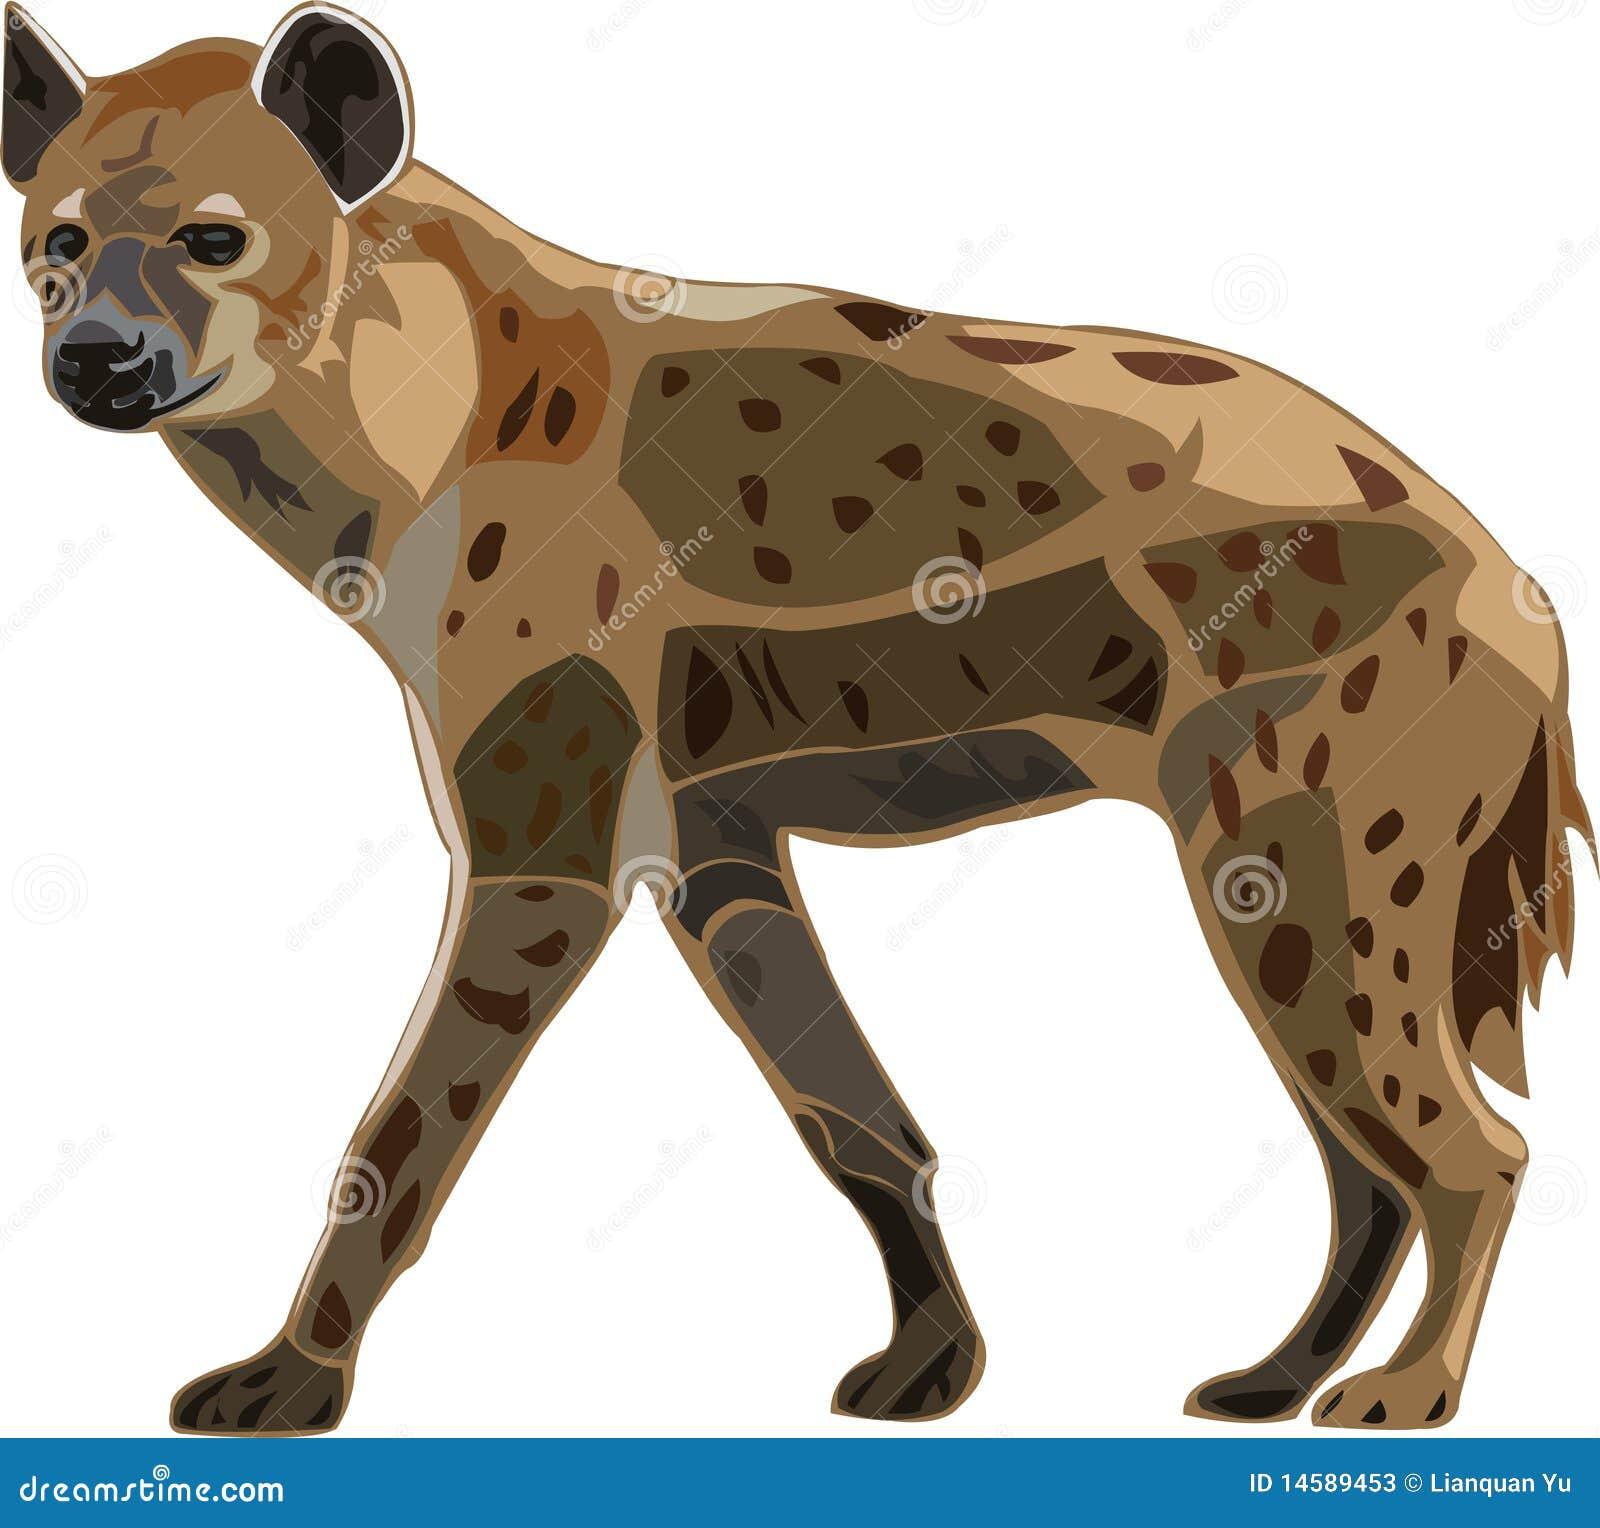 Scavenger On The African Grasslands - Spot Hyena Stock Photos - Image ...